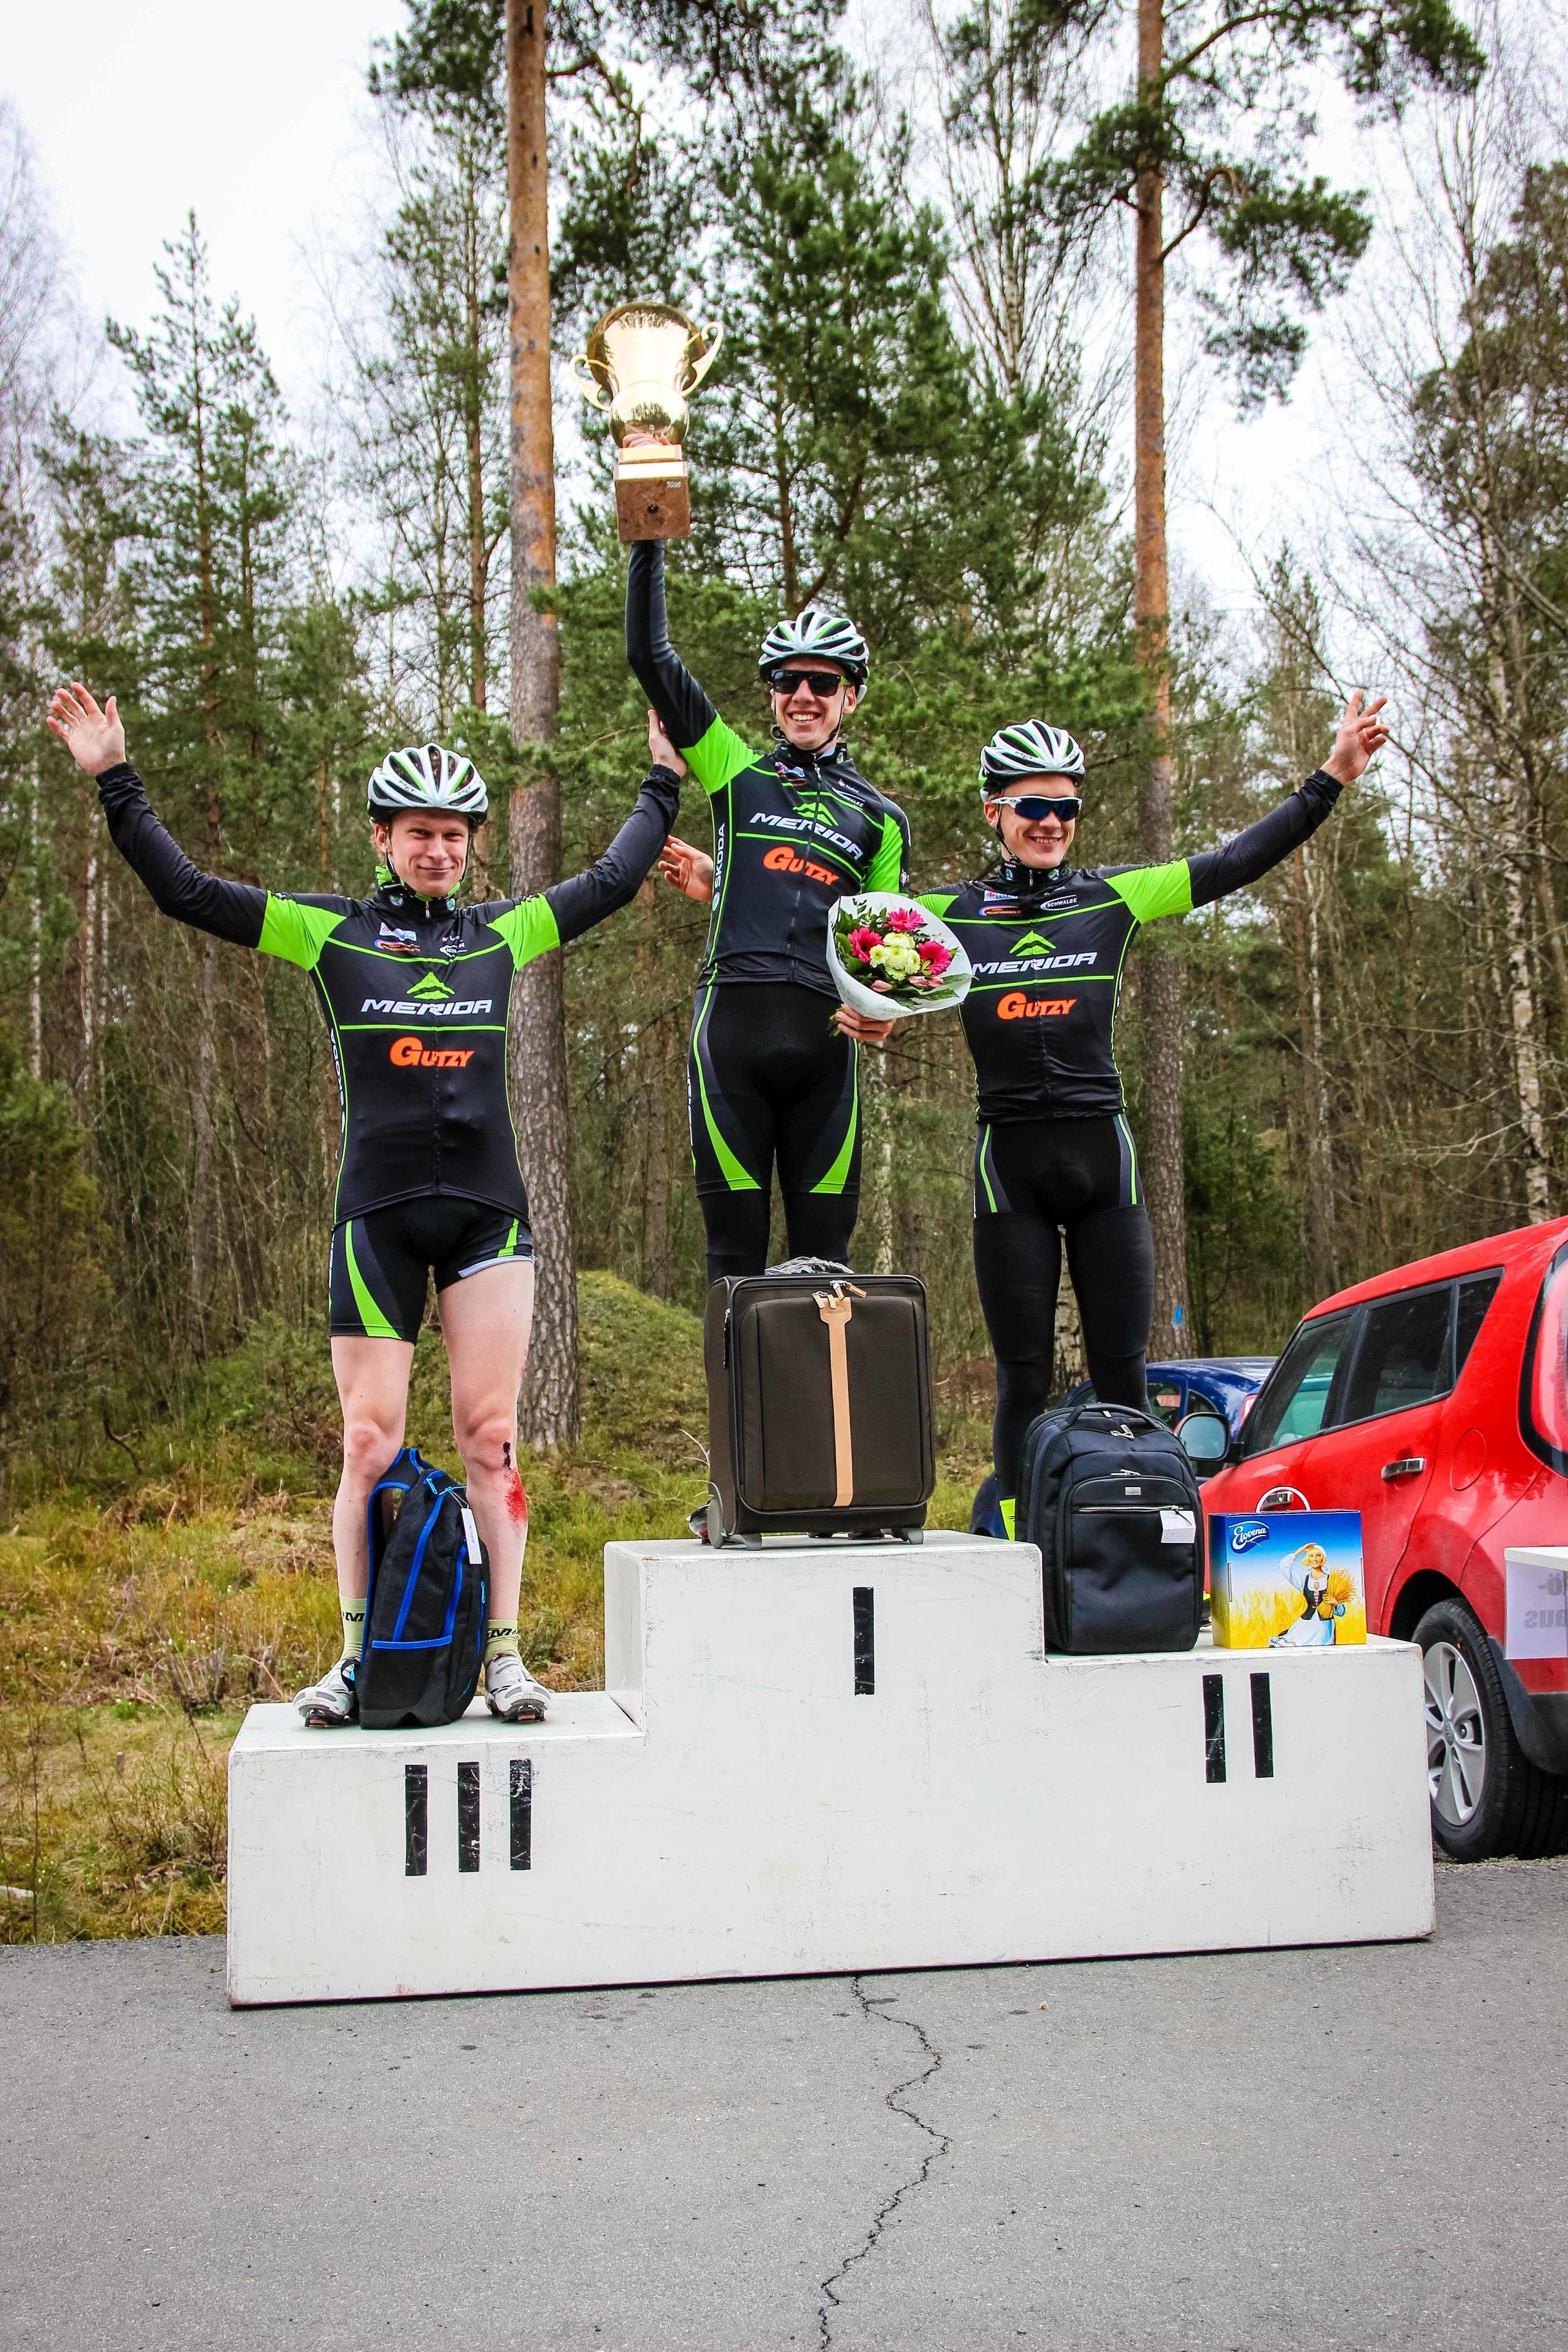 Elite podium, Sami Tiainen (3rd), Ben Carman (1st) and Roope Nurmi (2nd)